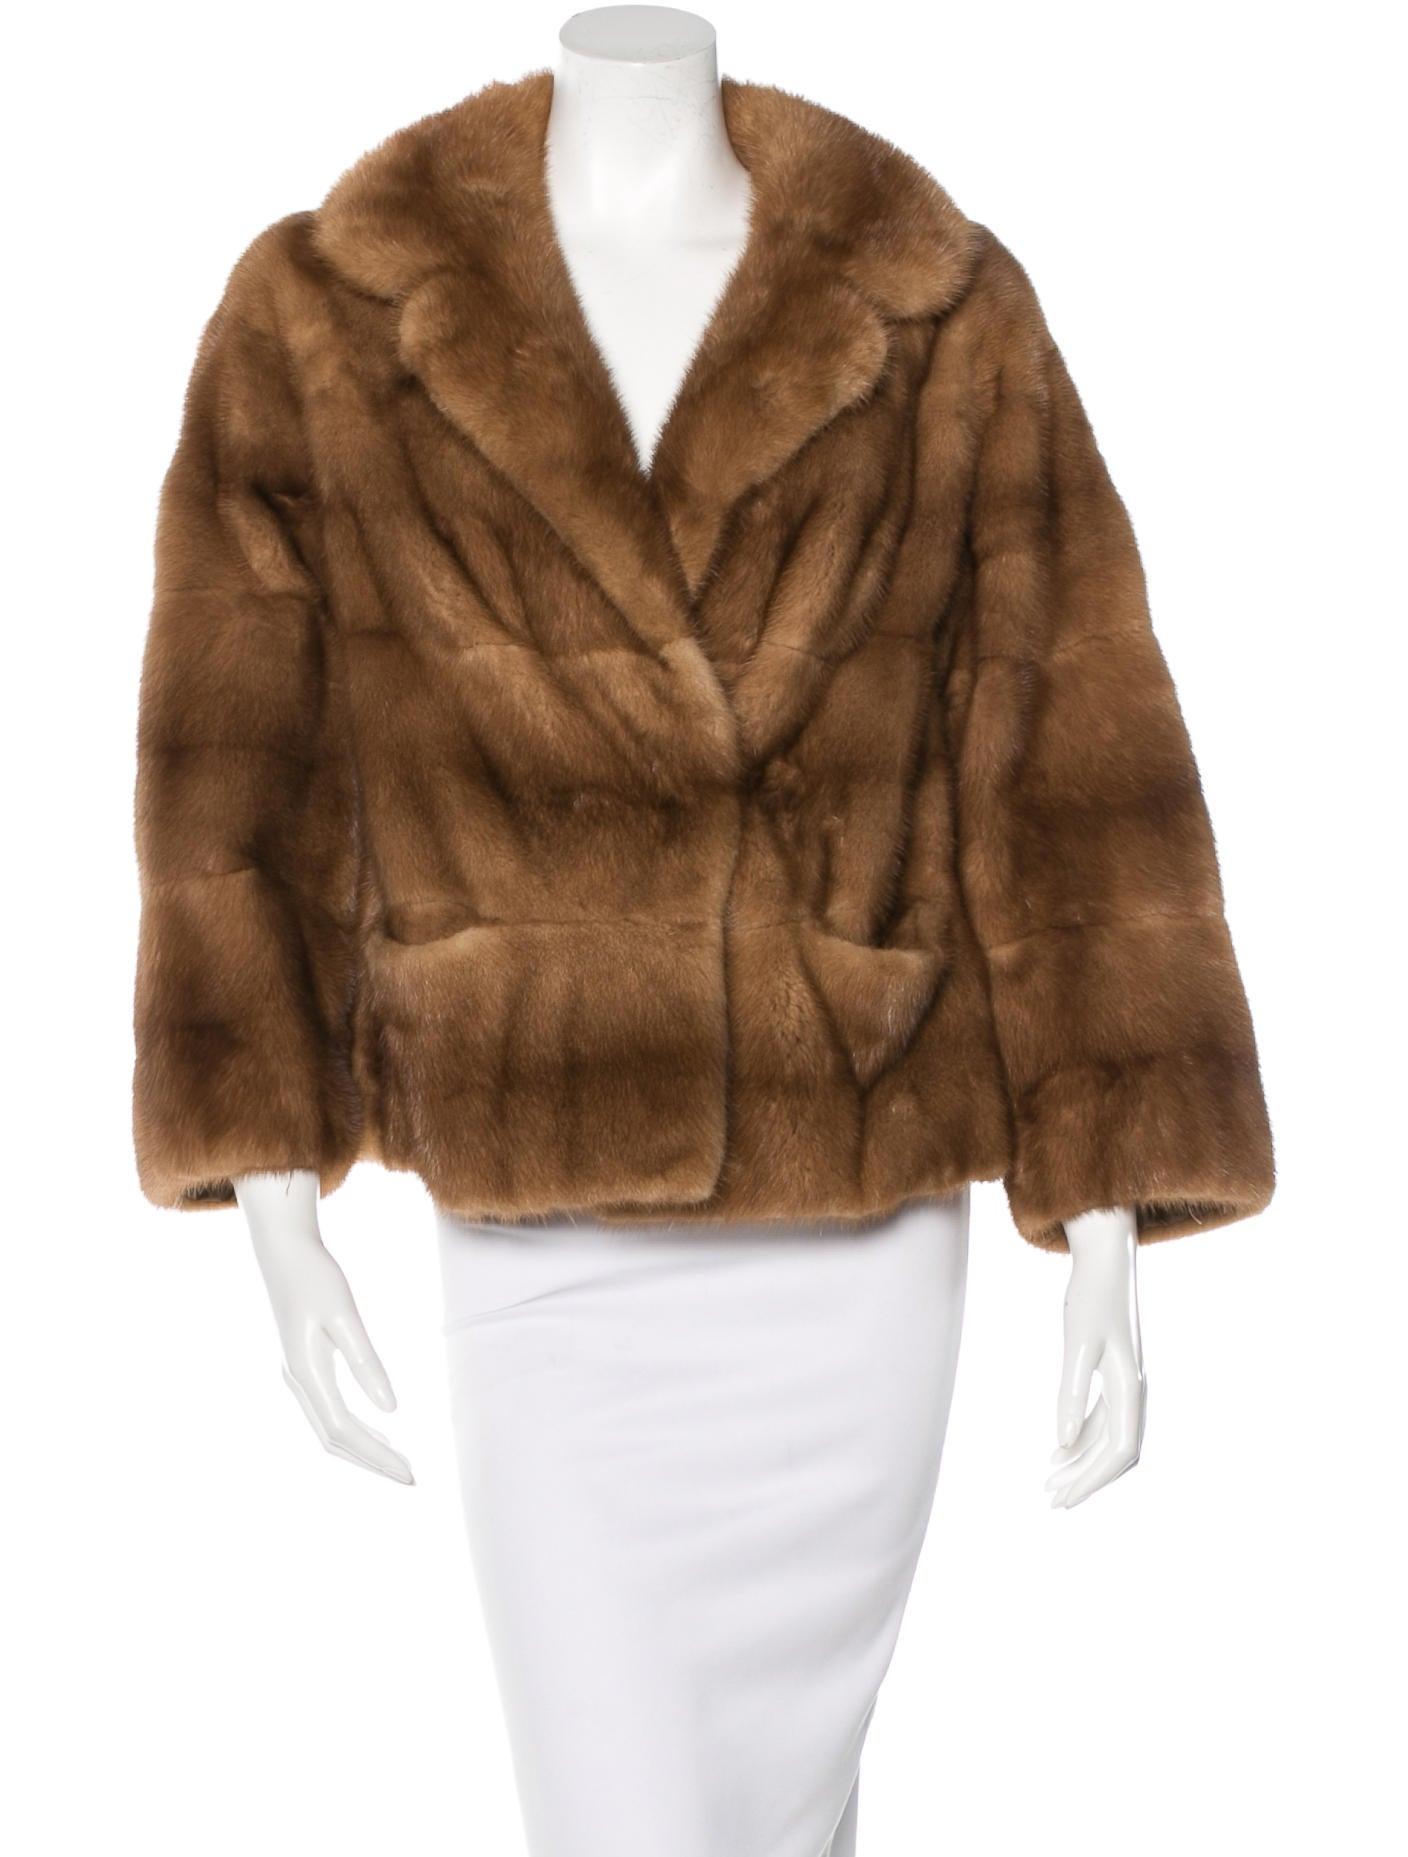 neiman marcus horizontal mink jacket clothing. Black Bedroom Furniture Sets. Home Design Ideas